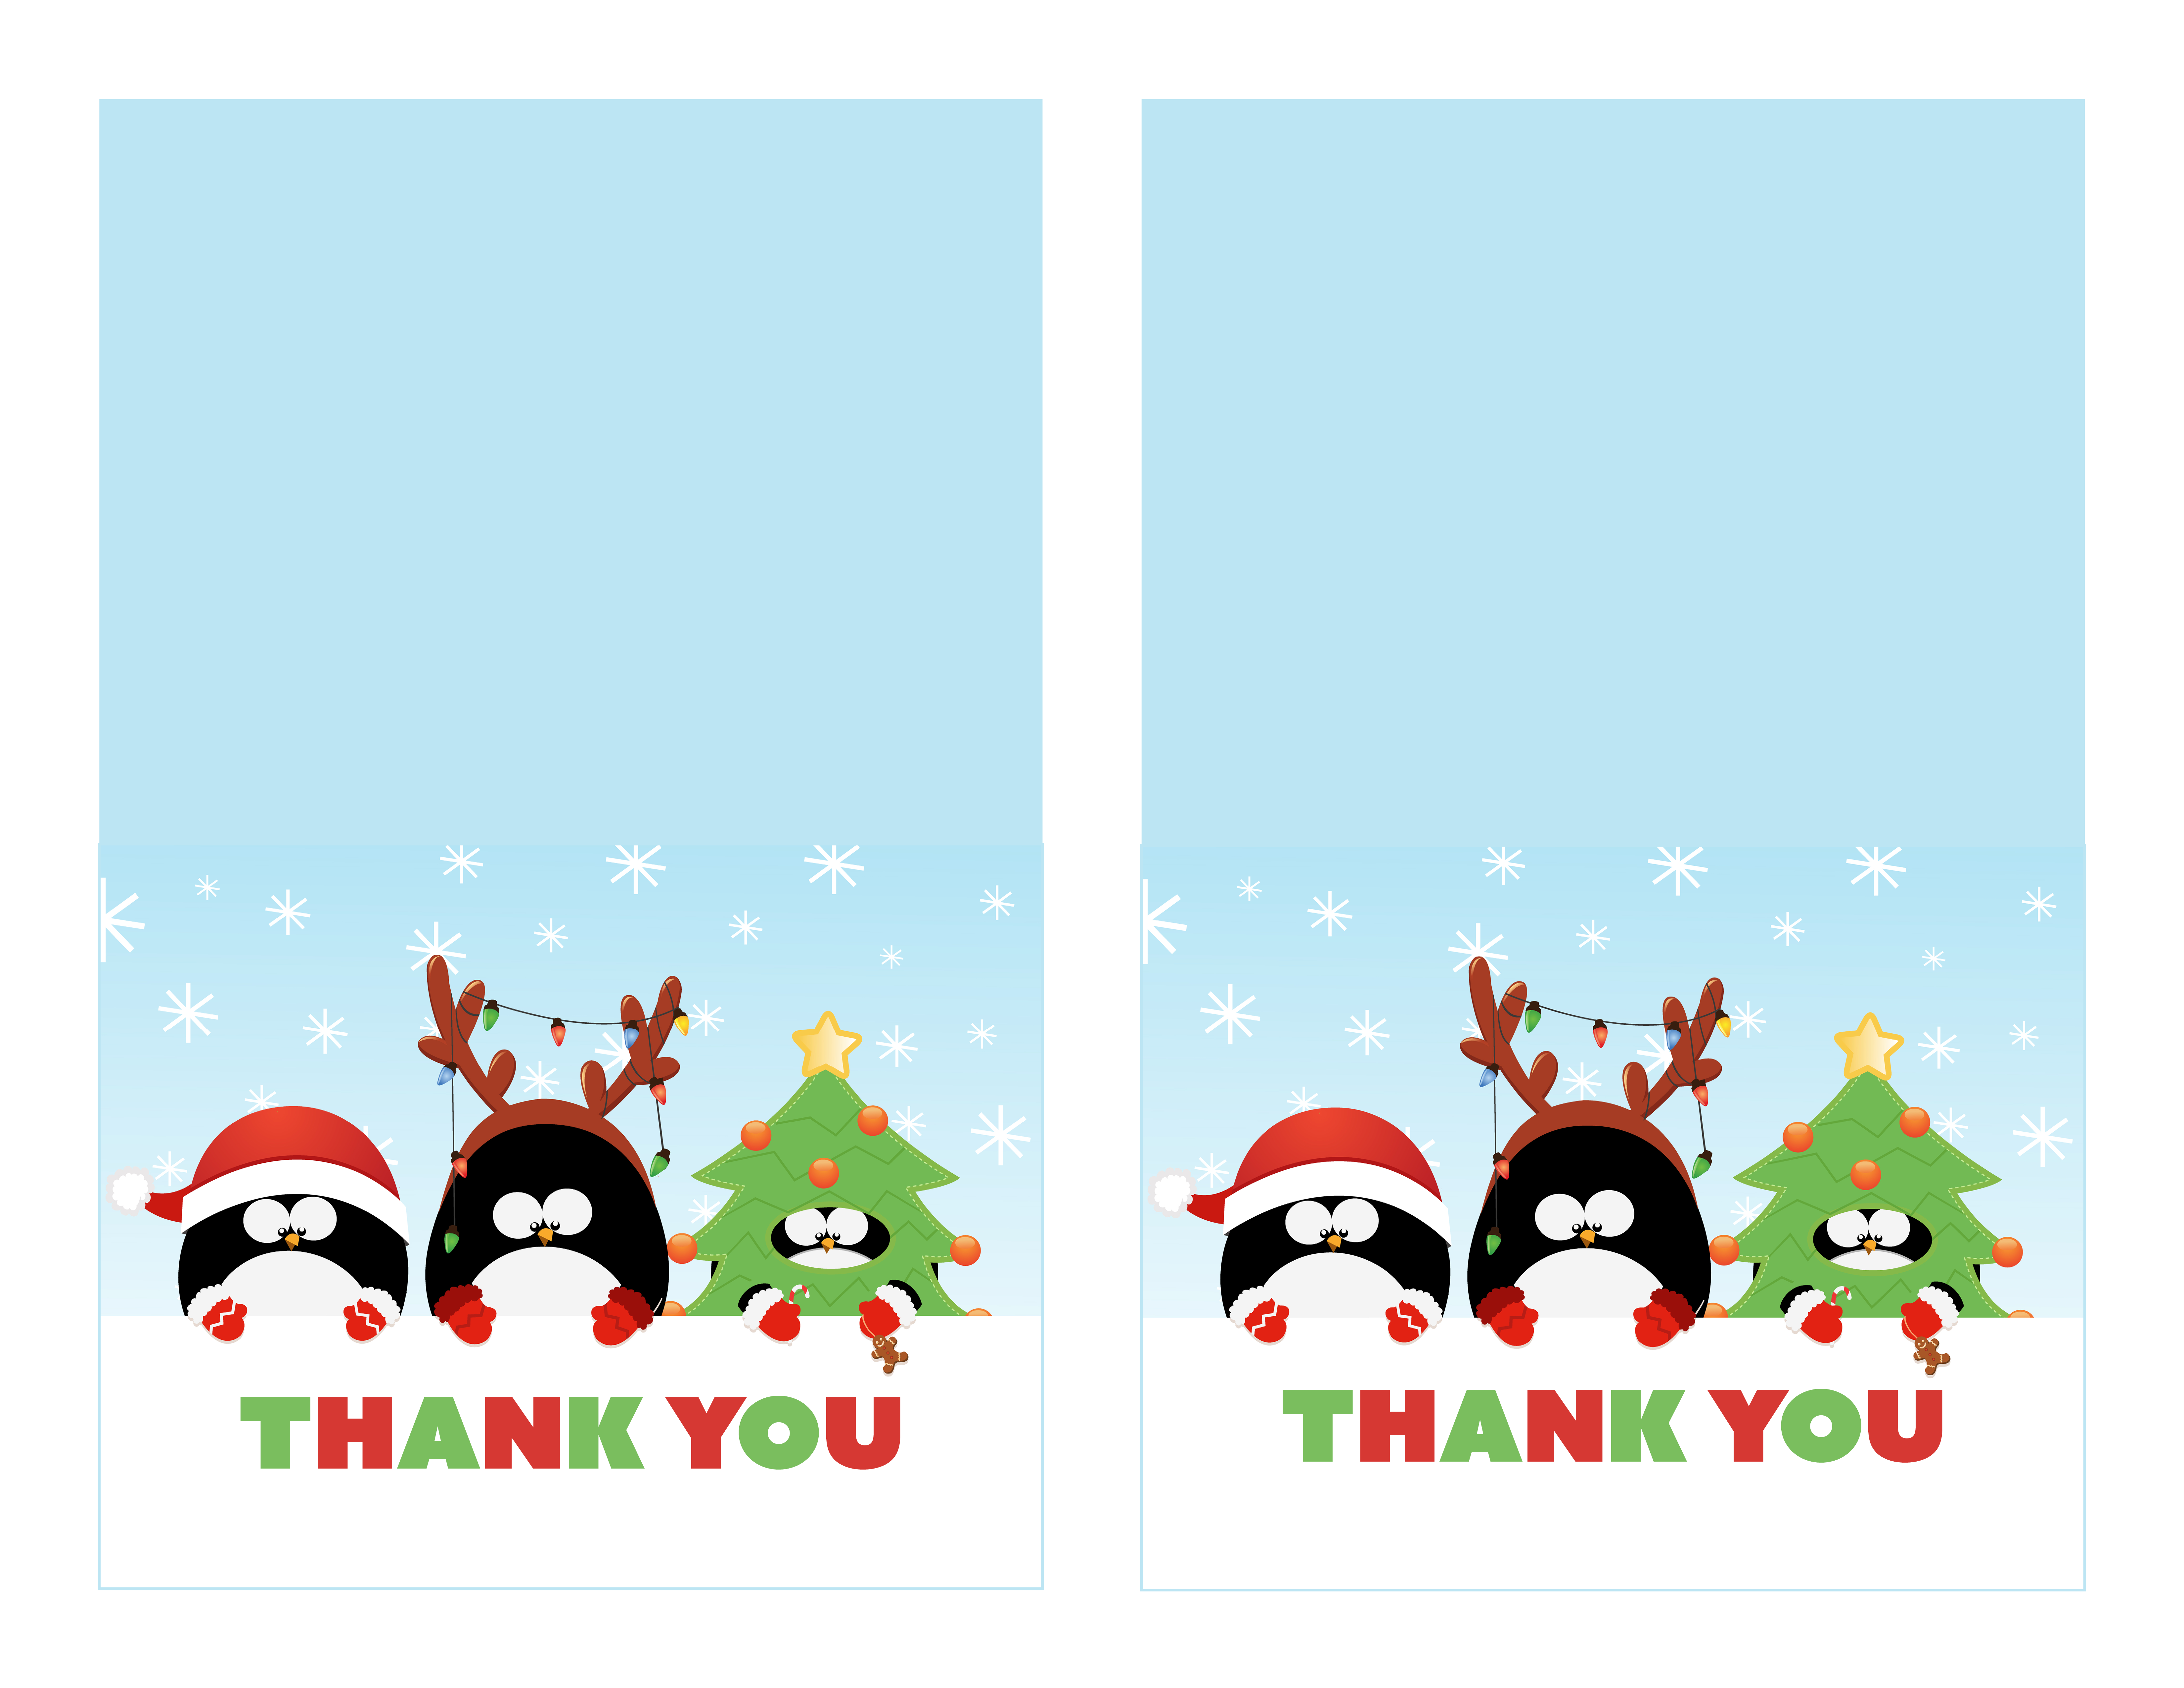 21 Adding Christmas Thank You Card Templates Free Download for Within Christmas Thank You Card Templates Free